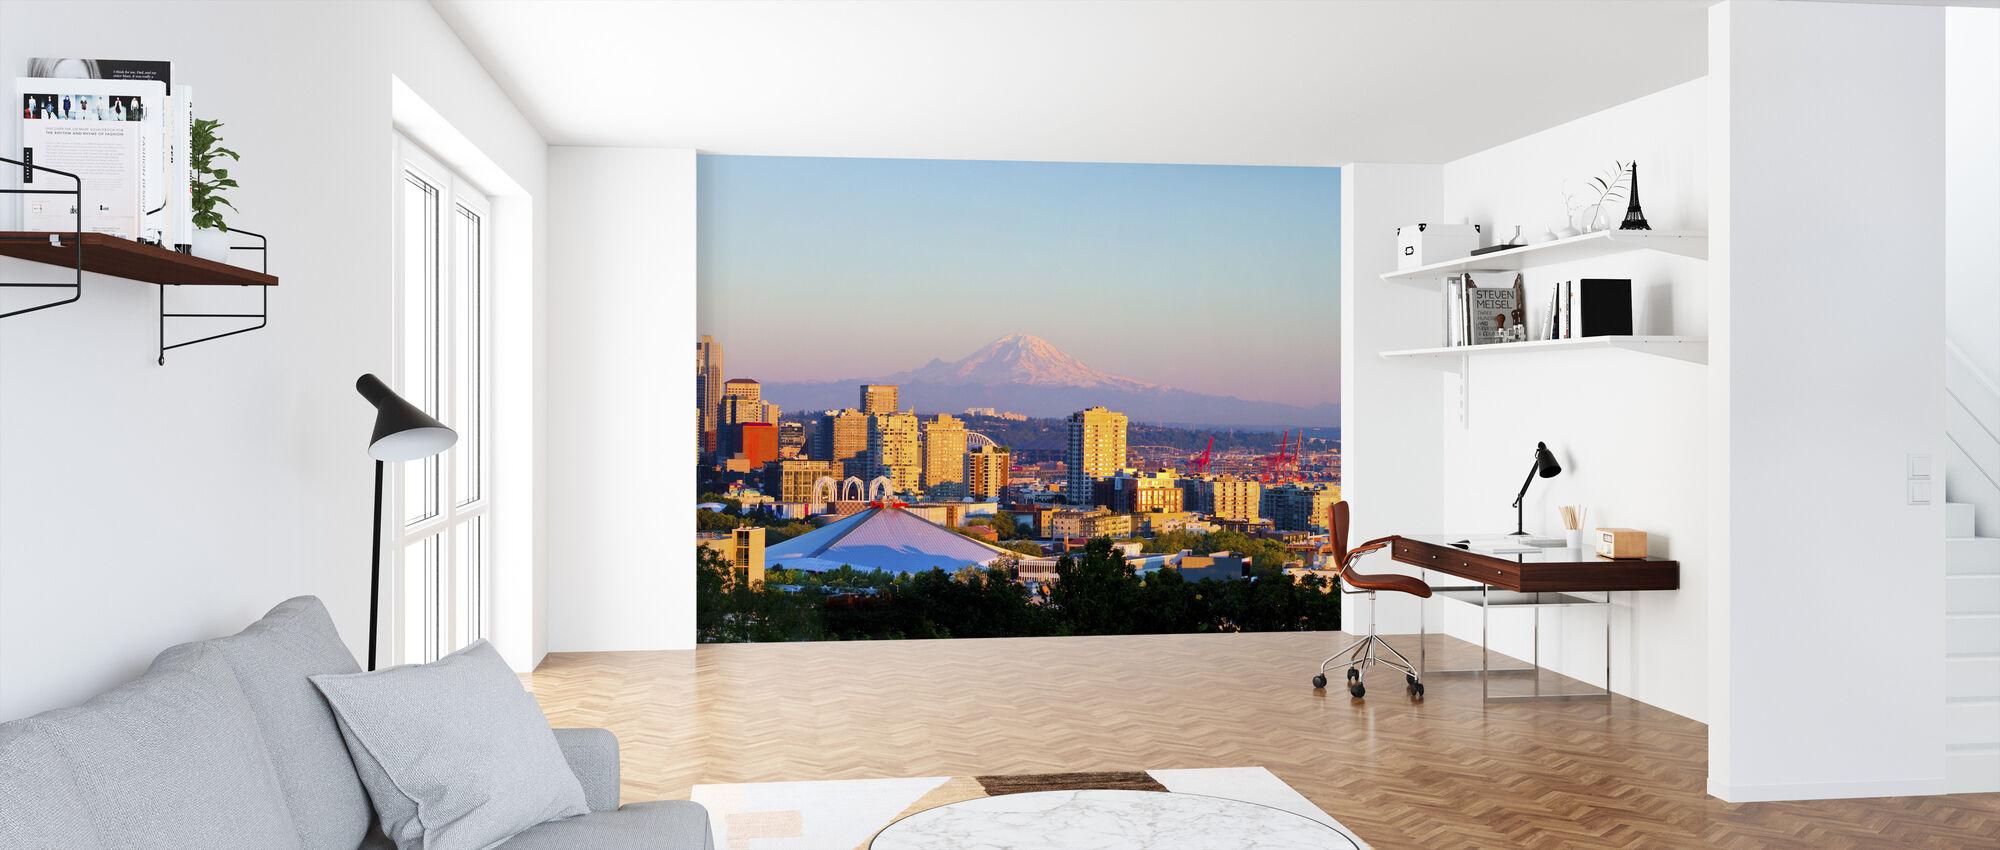 Seattle and Mount Rainier - Wallpaper - Office